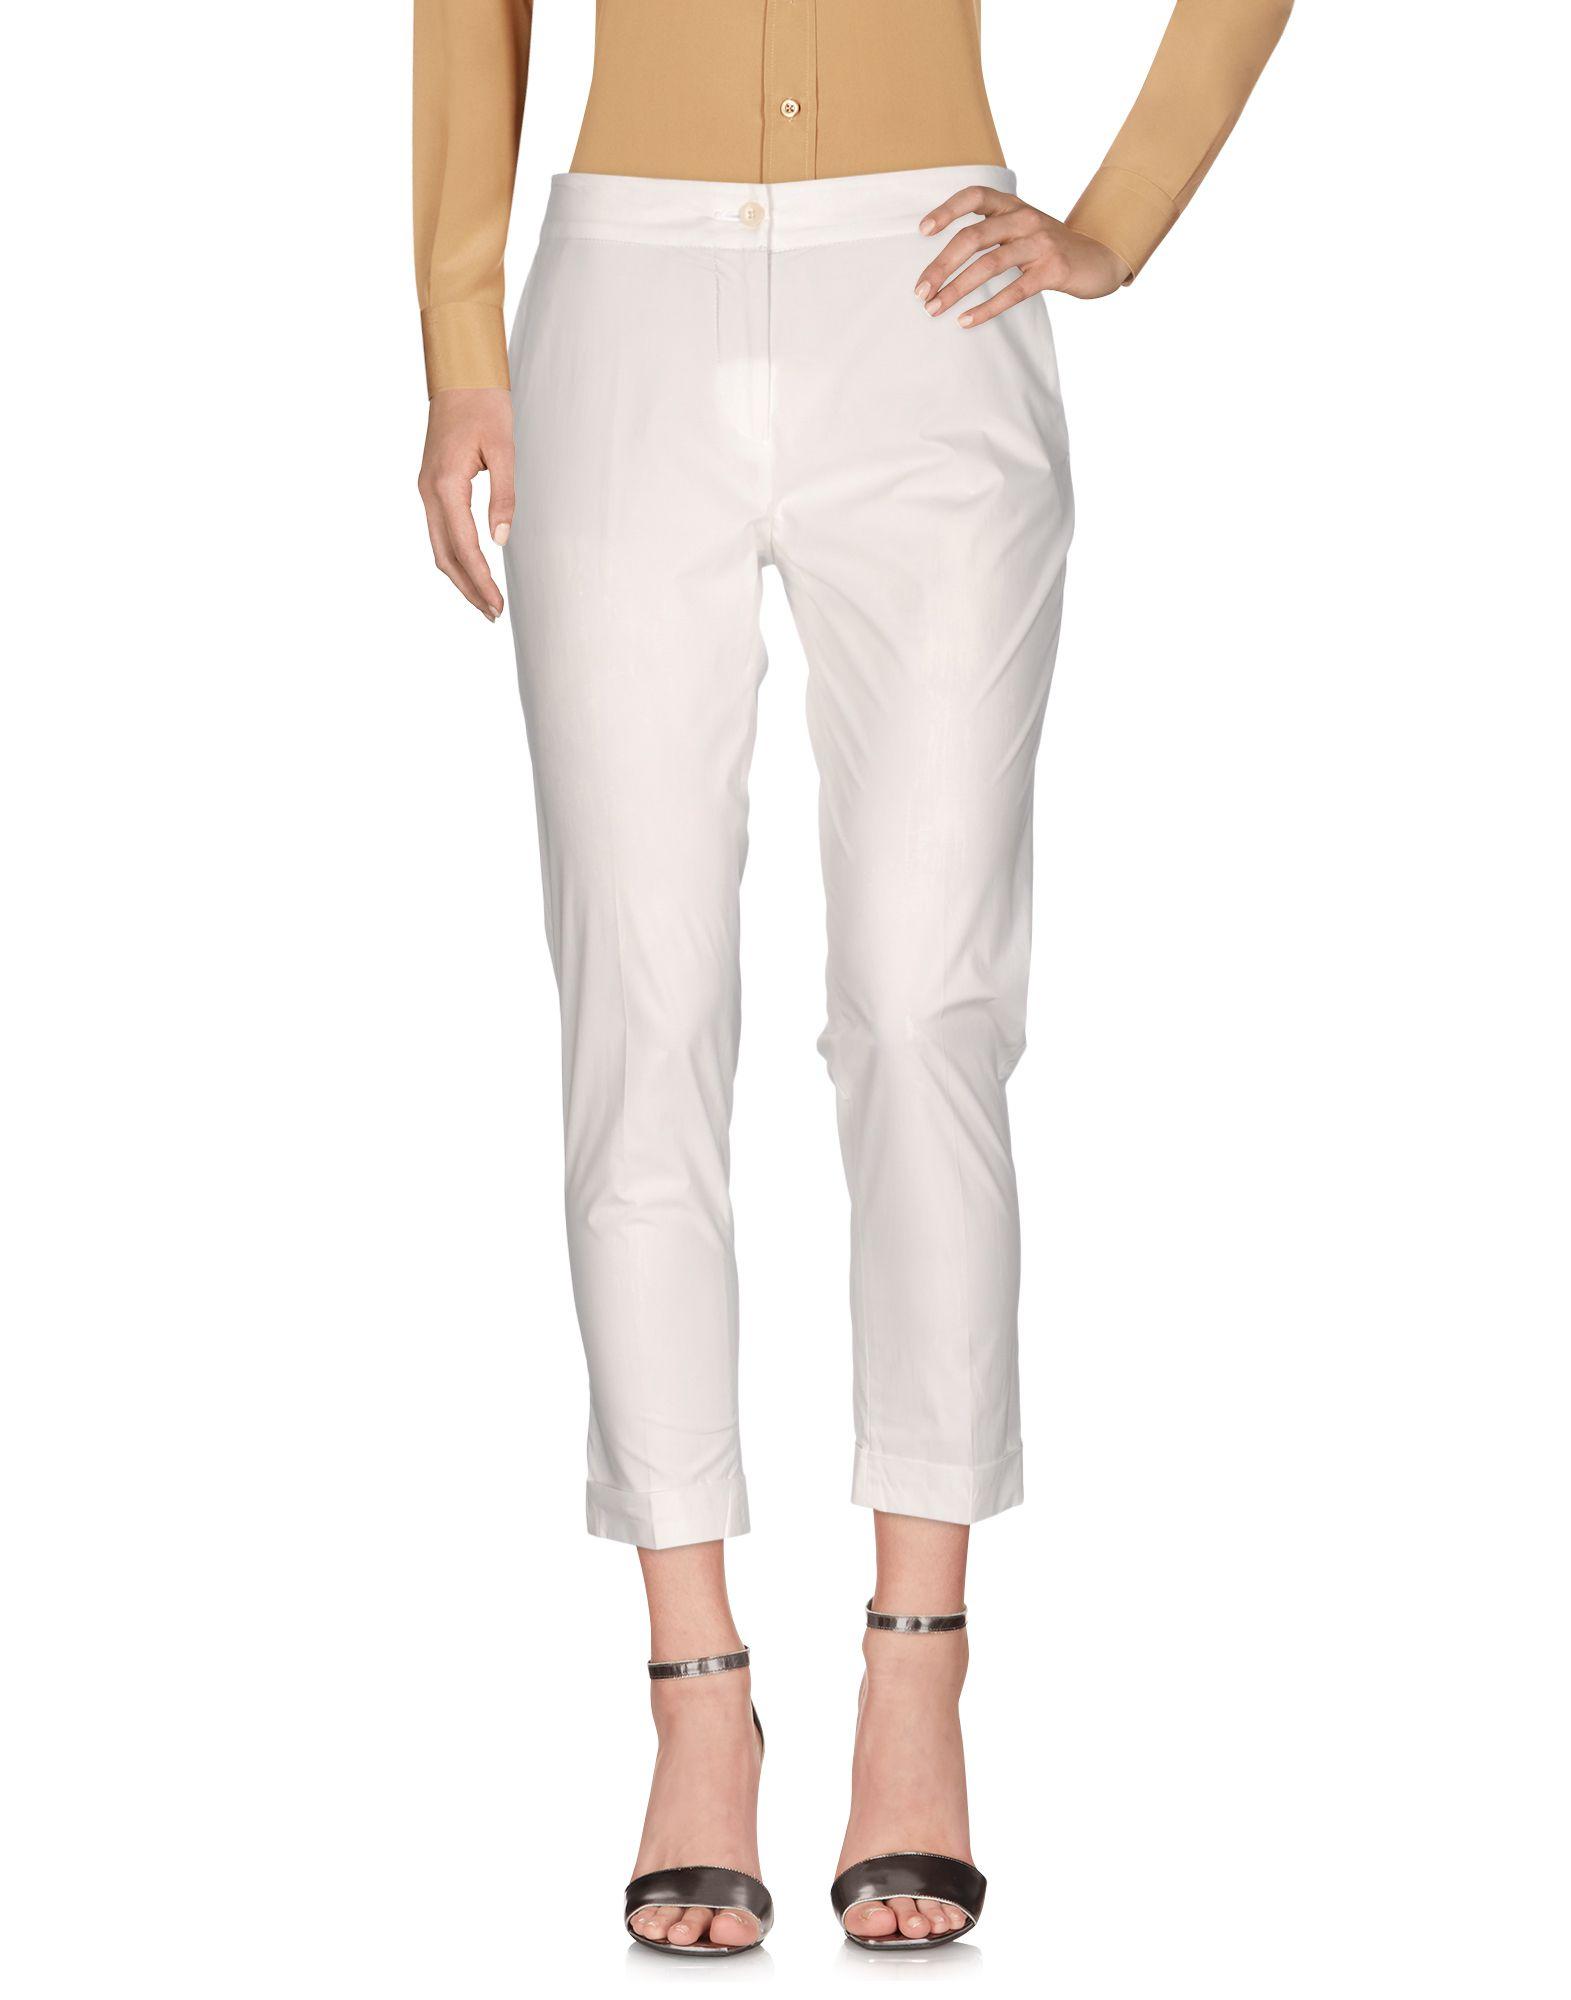 Pantalone Etro Donna - Acquista online su gSTeF